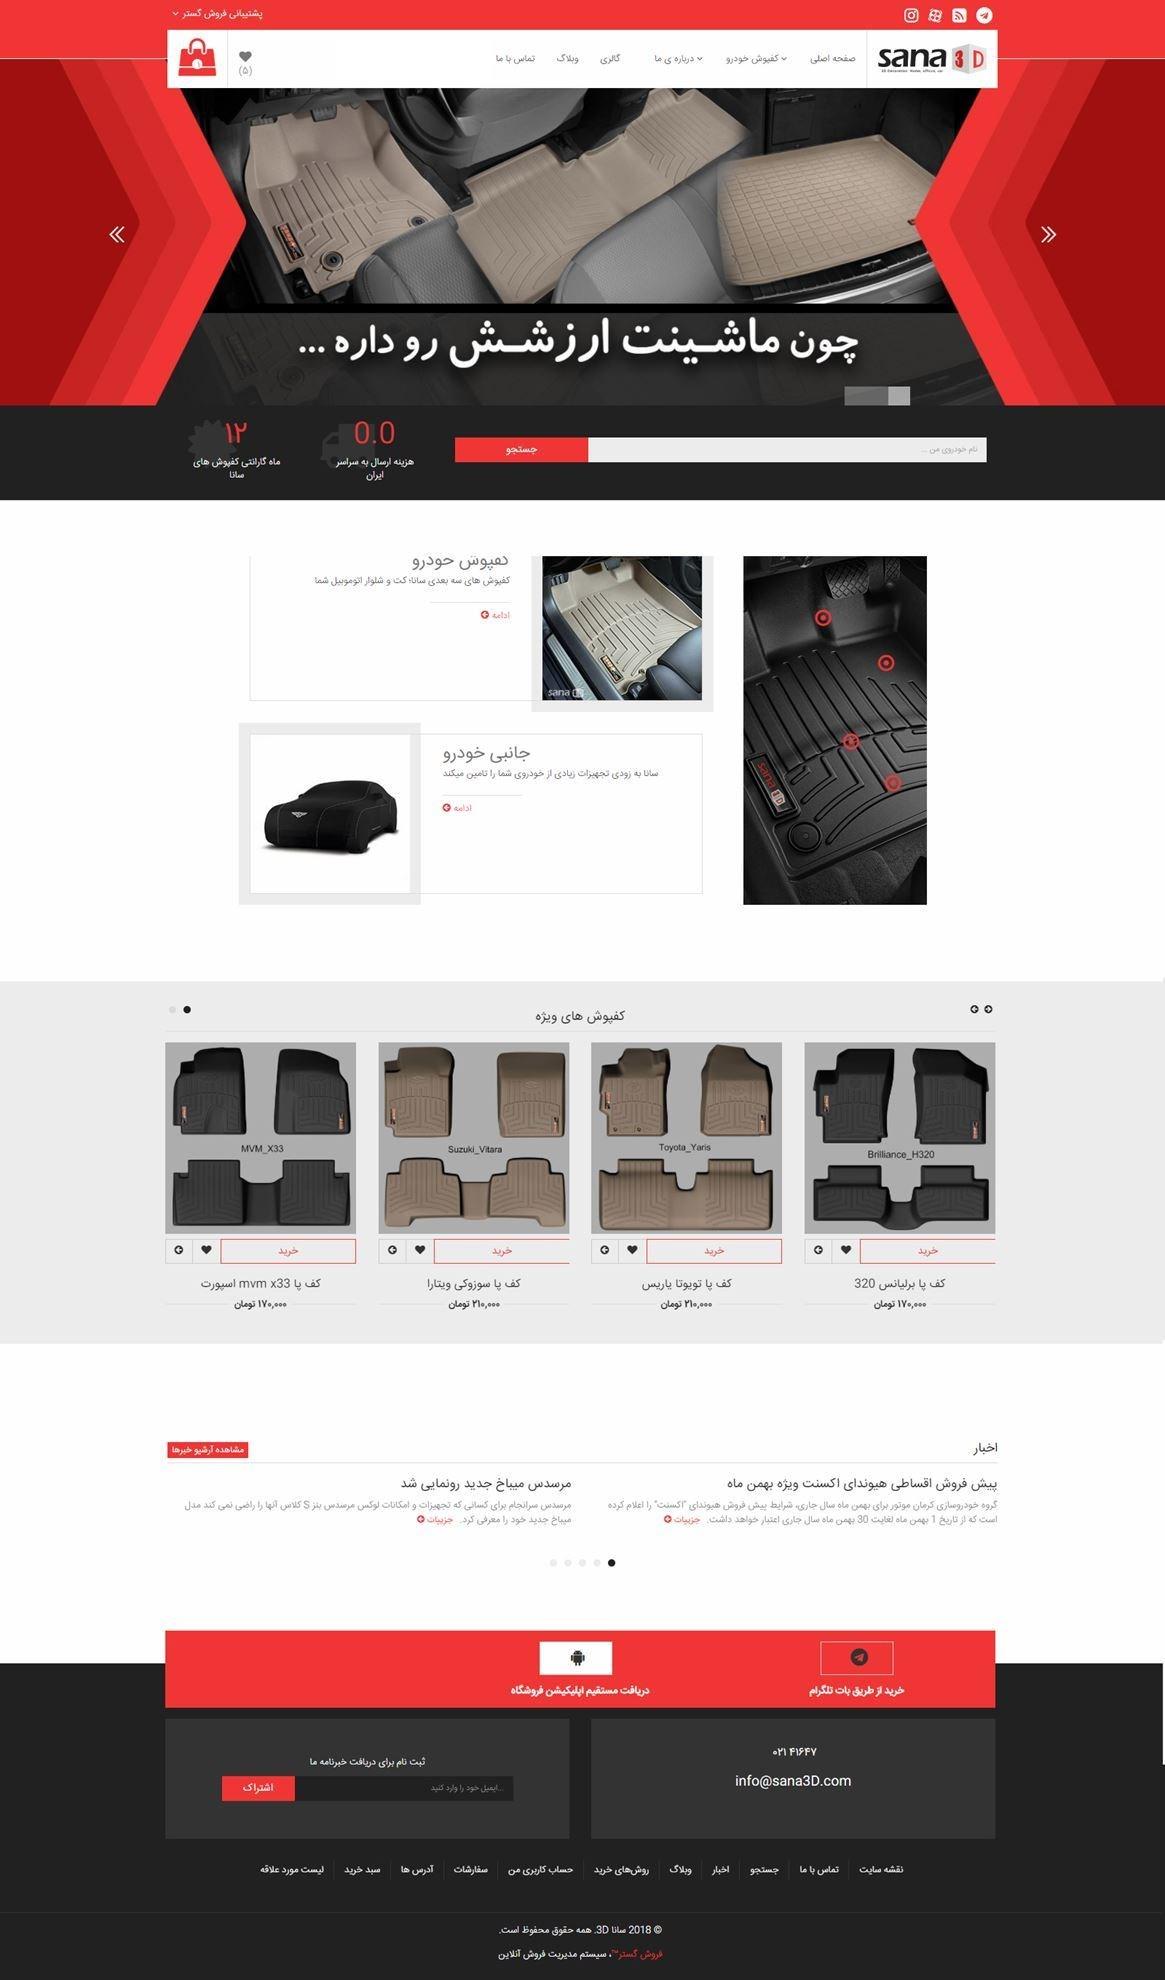 فروشگاه آنلاین سانا 3D